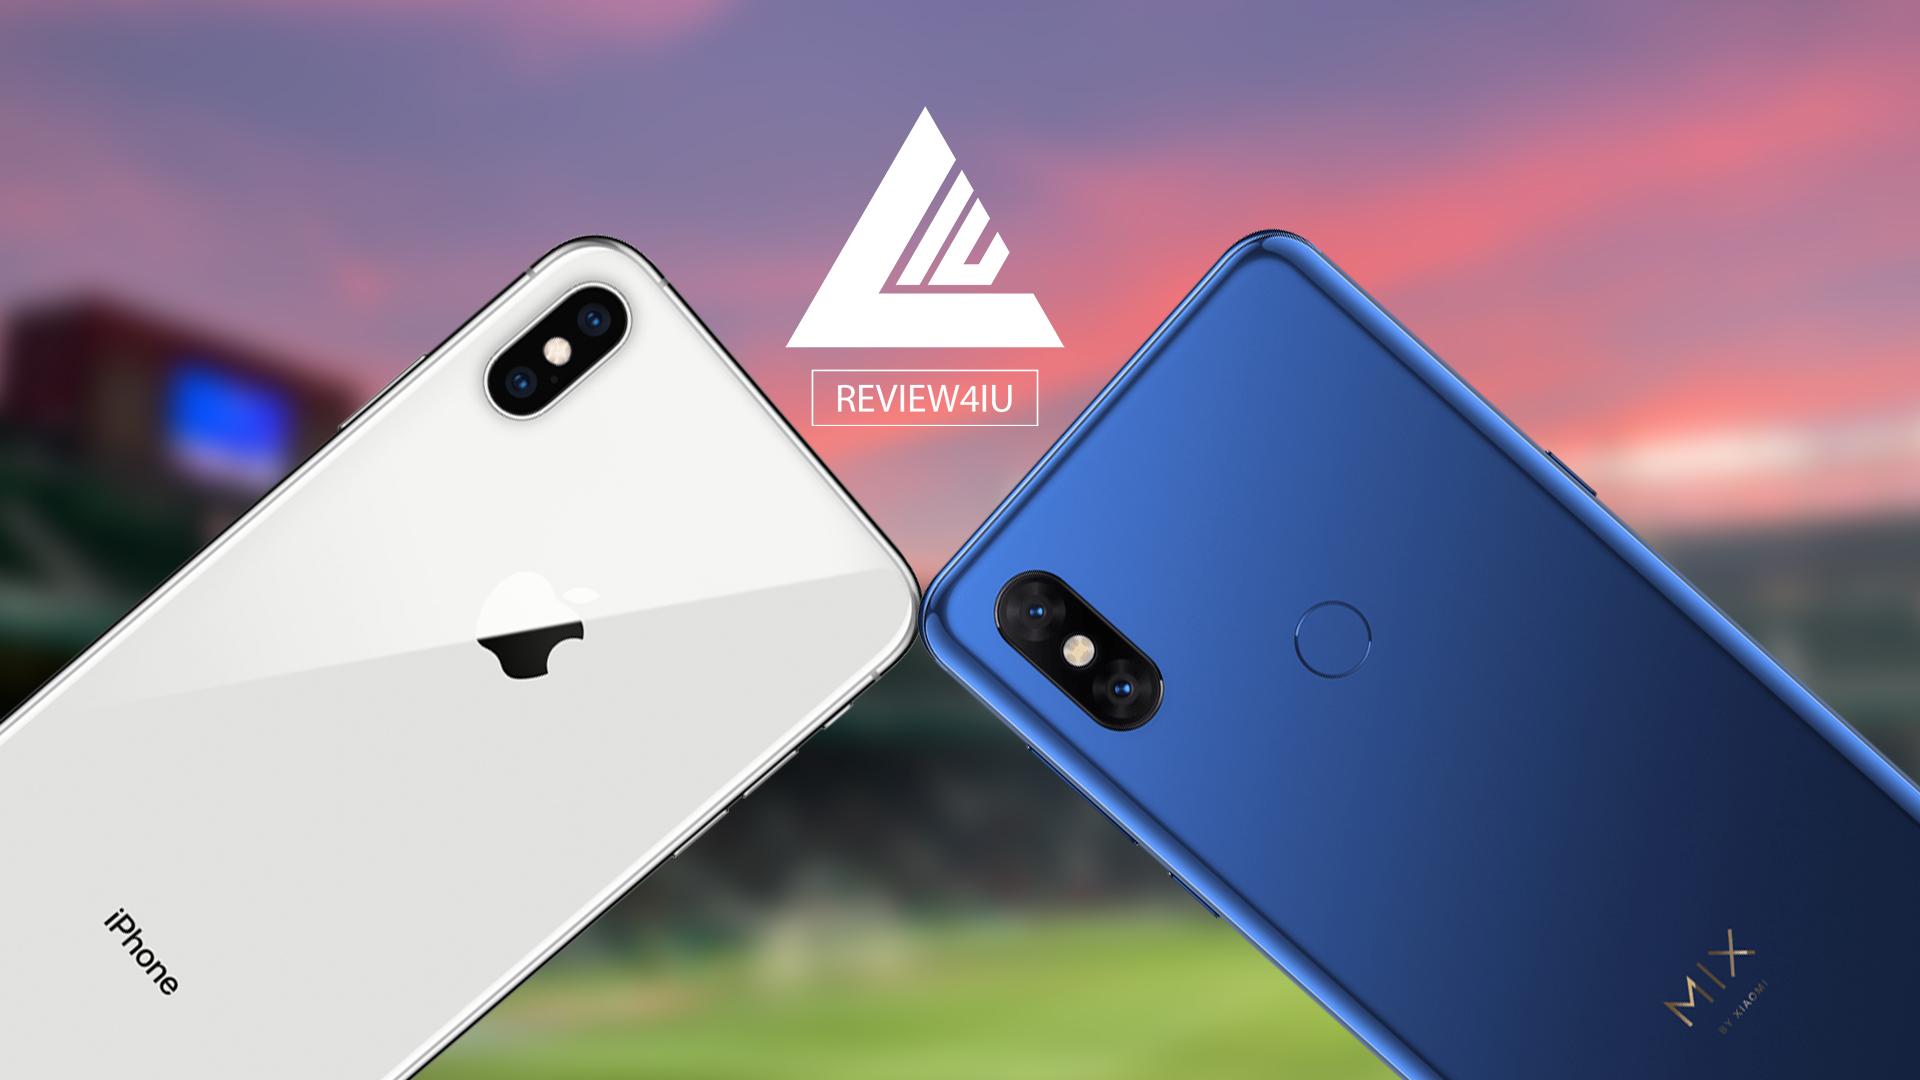 Xiaomi Mi MIX 3 VS iPhone XS MAX